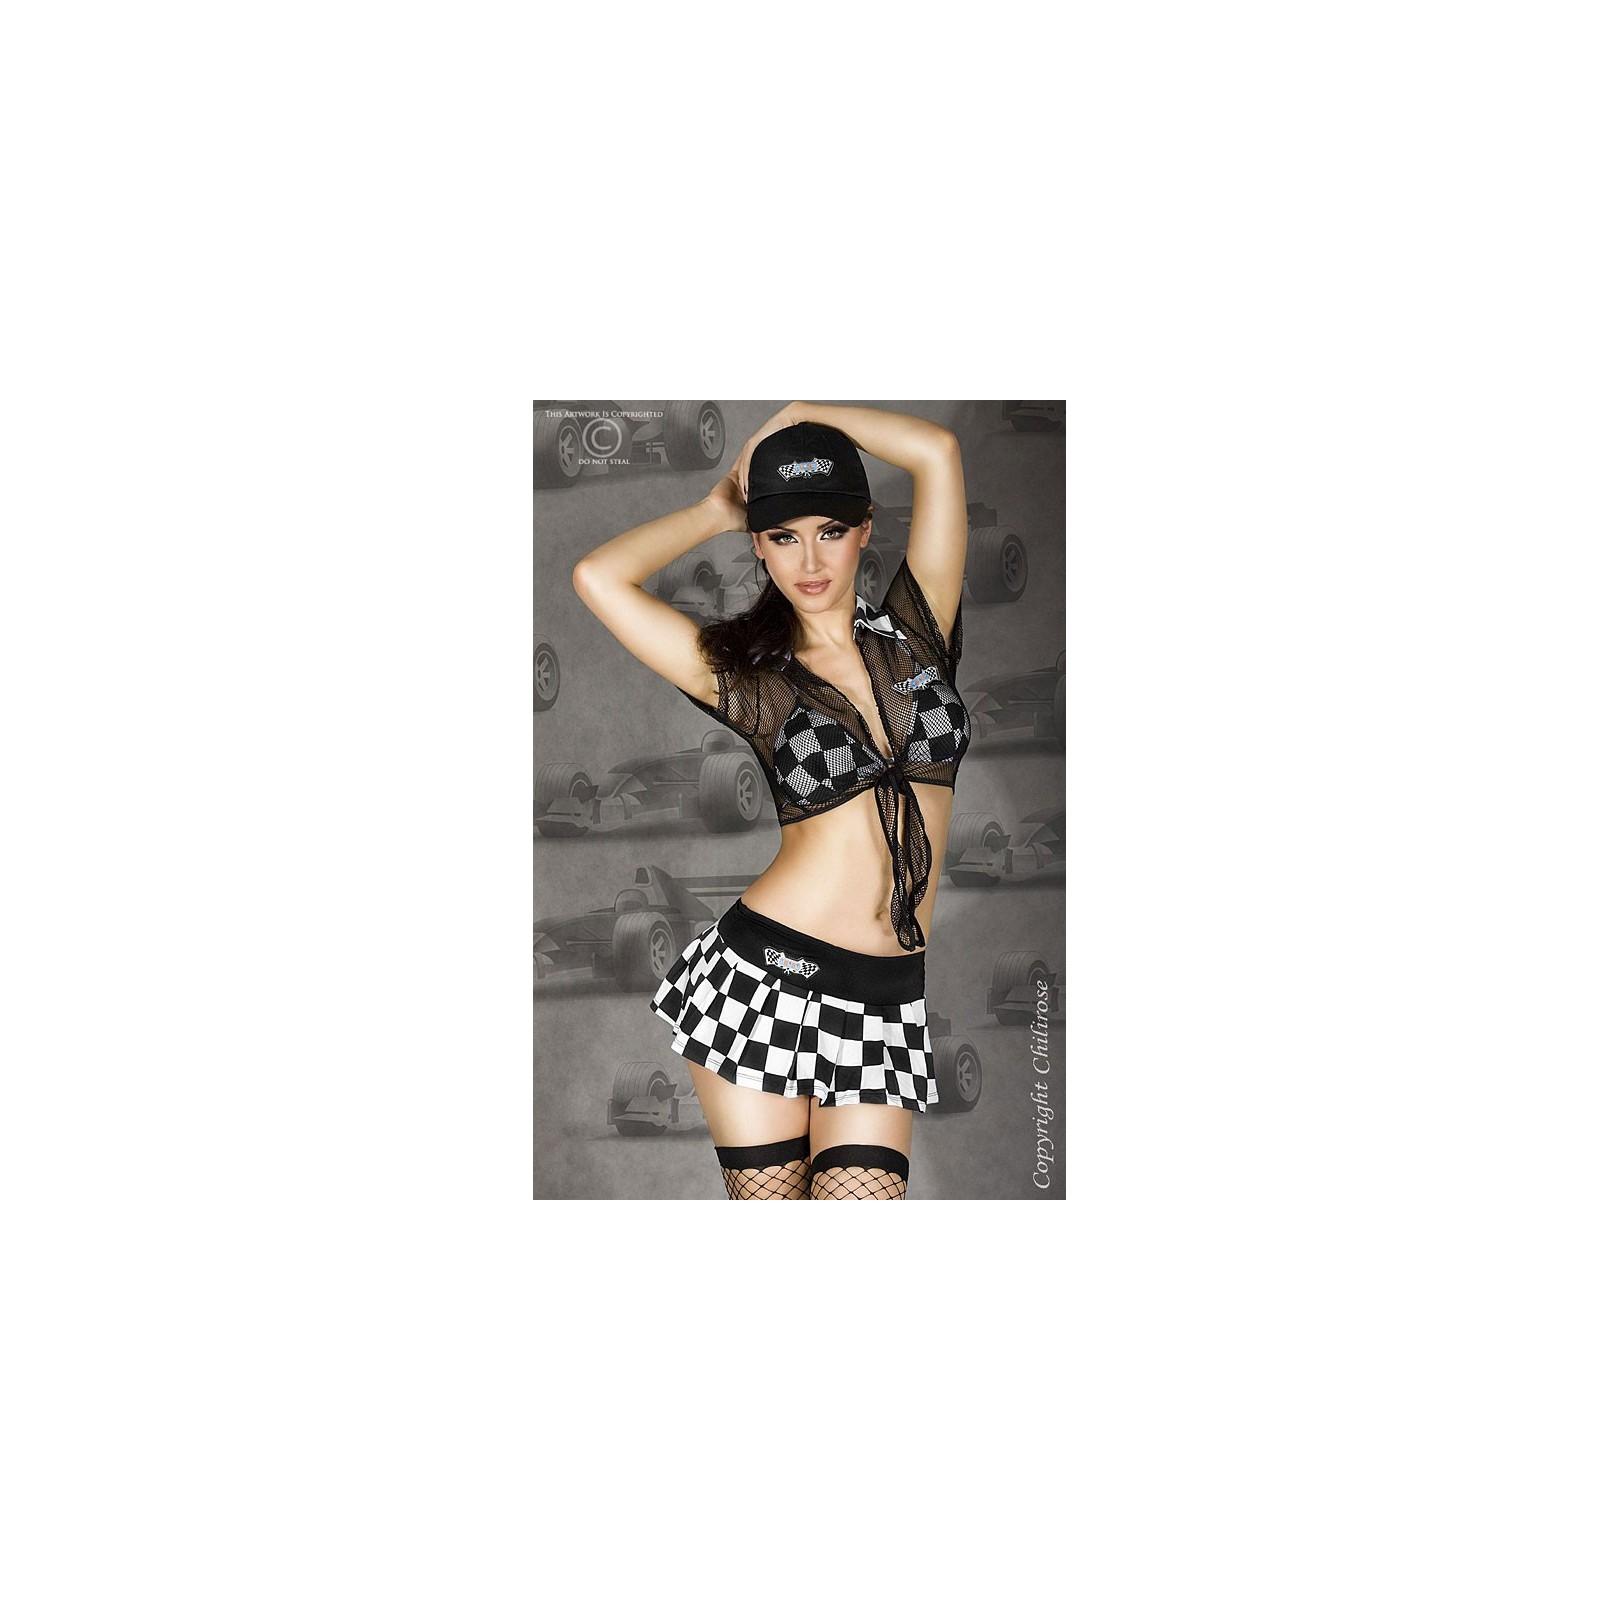 Racing Girl CR3326 - 1 - Vorschaubild